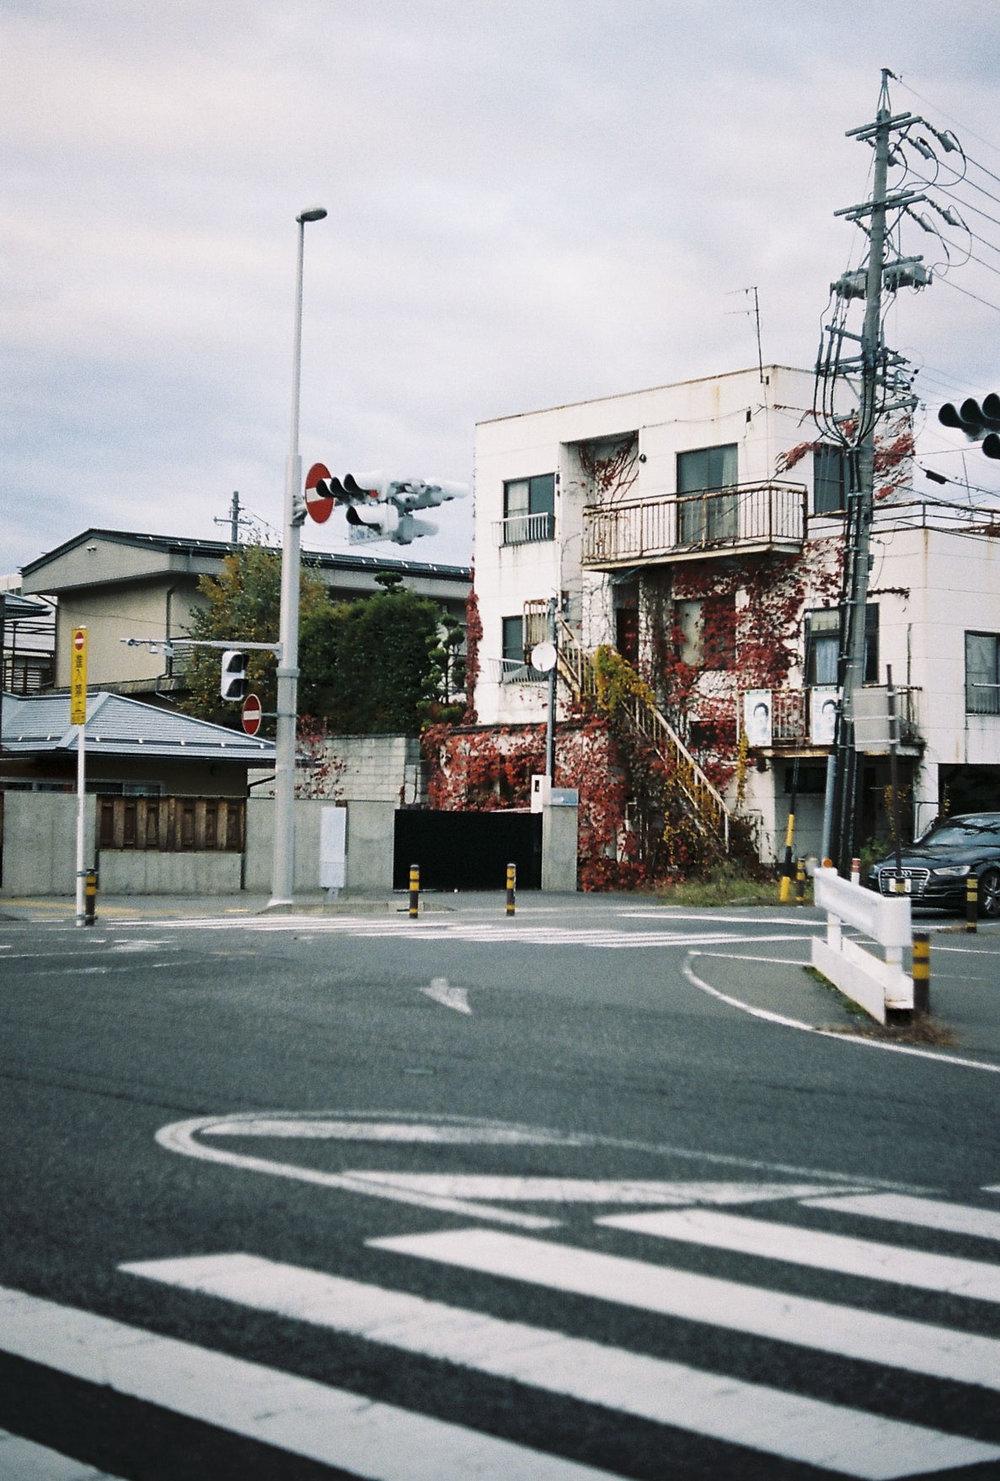 BDAY_LA_JAPAN_SNAP_LQ_209.JPG